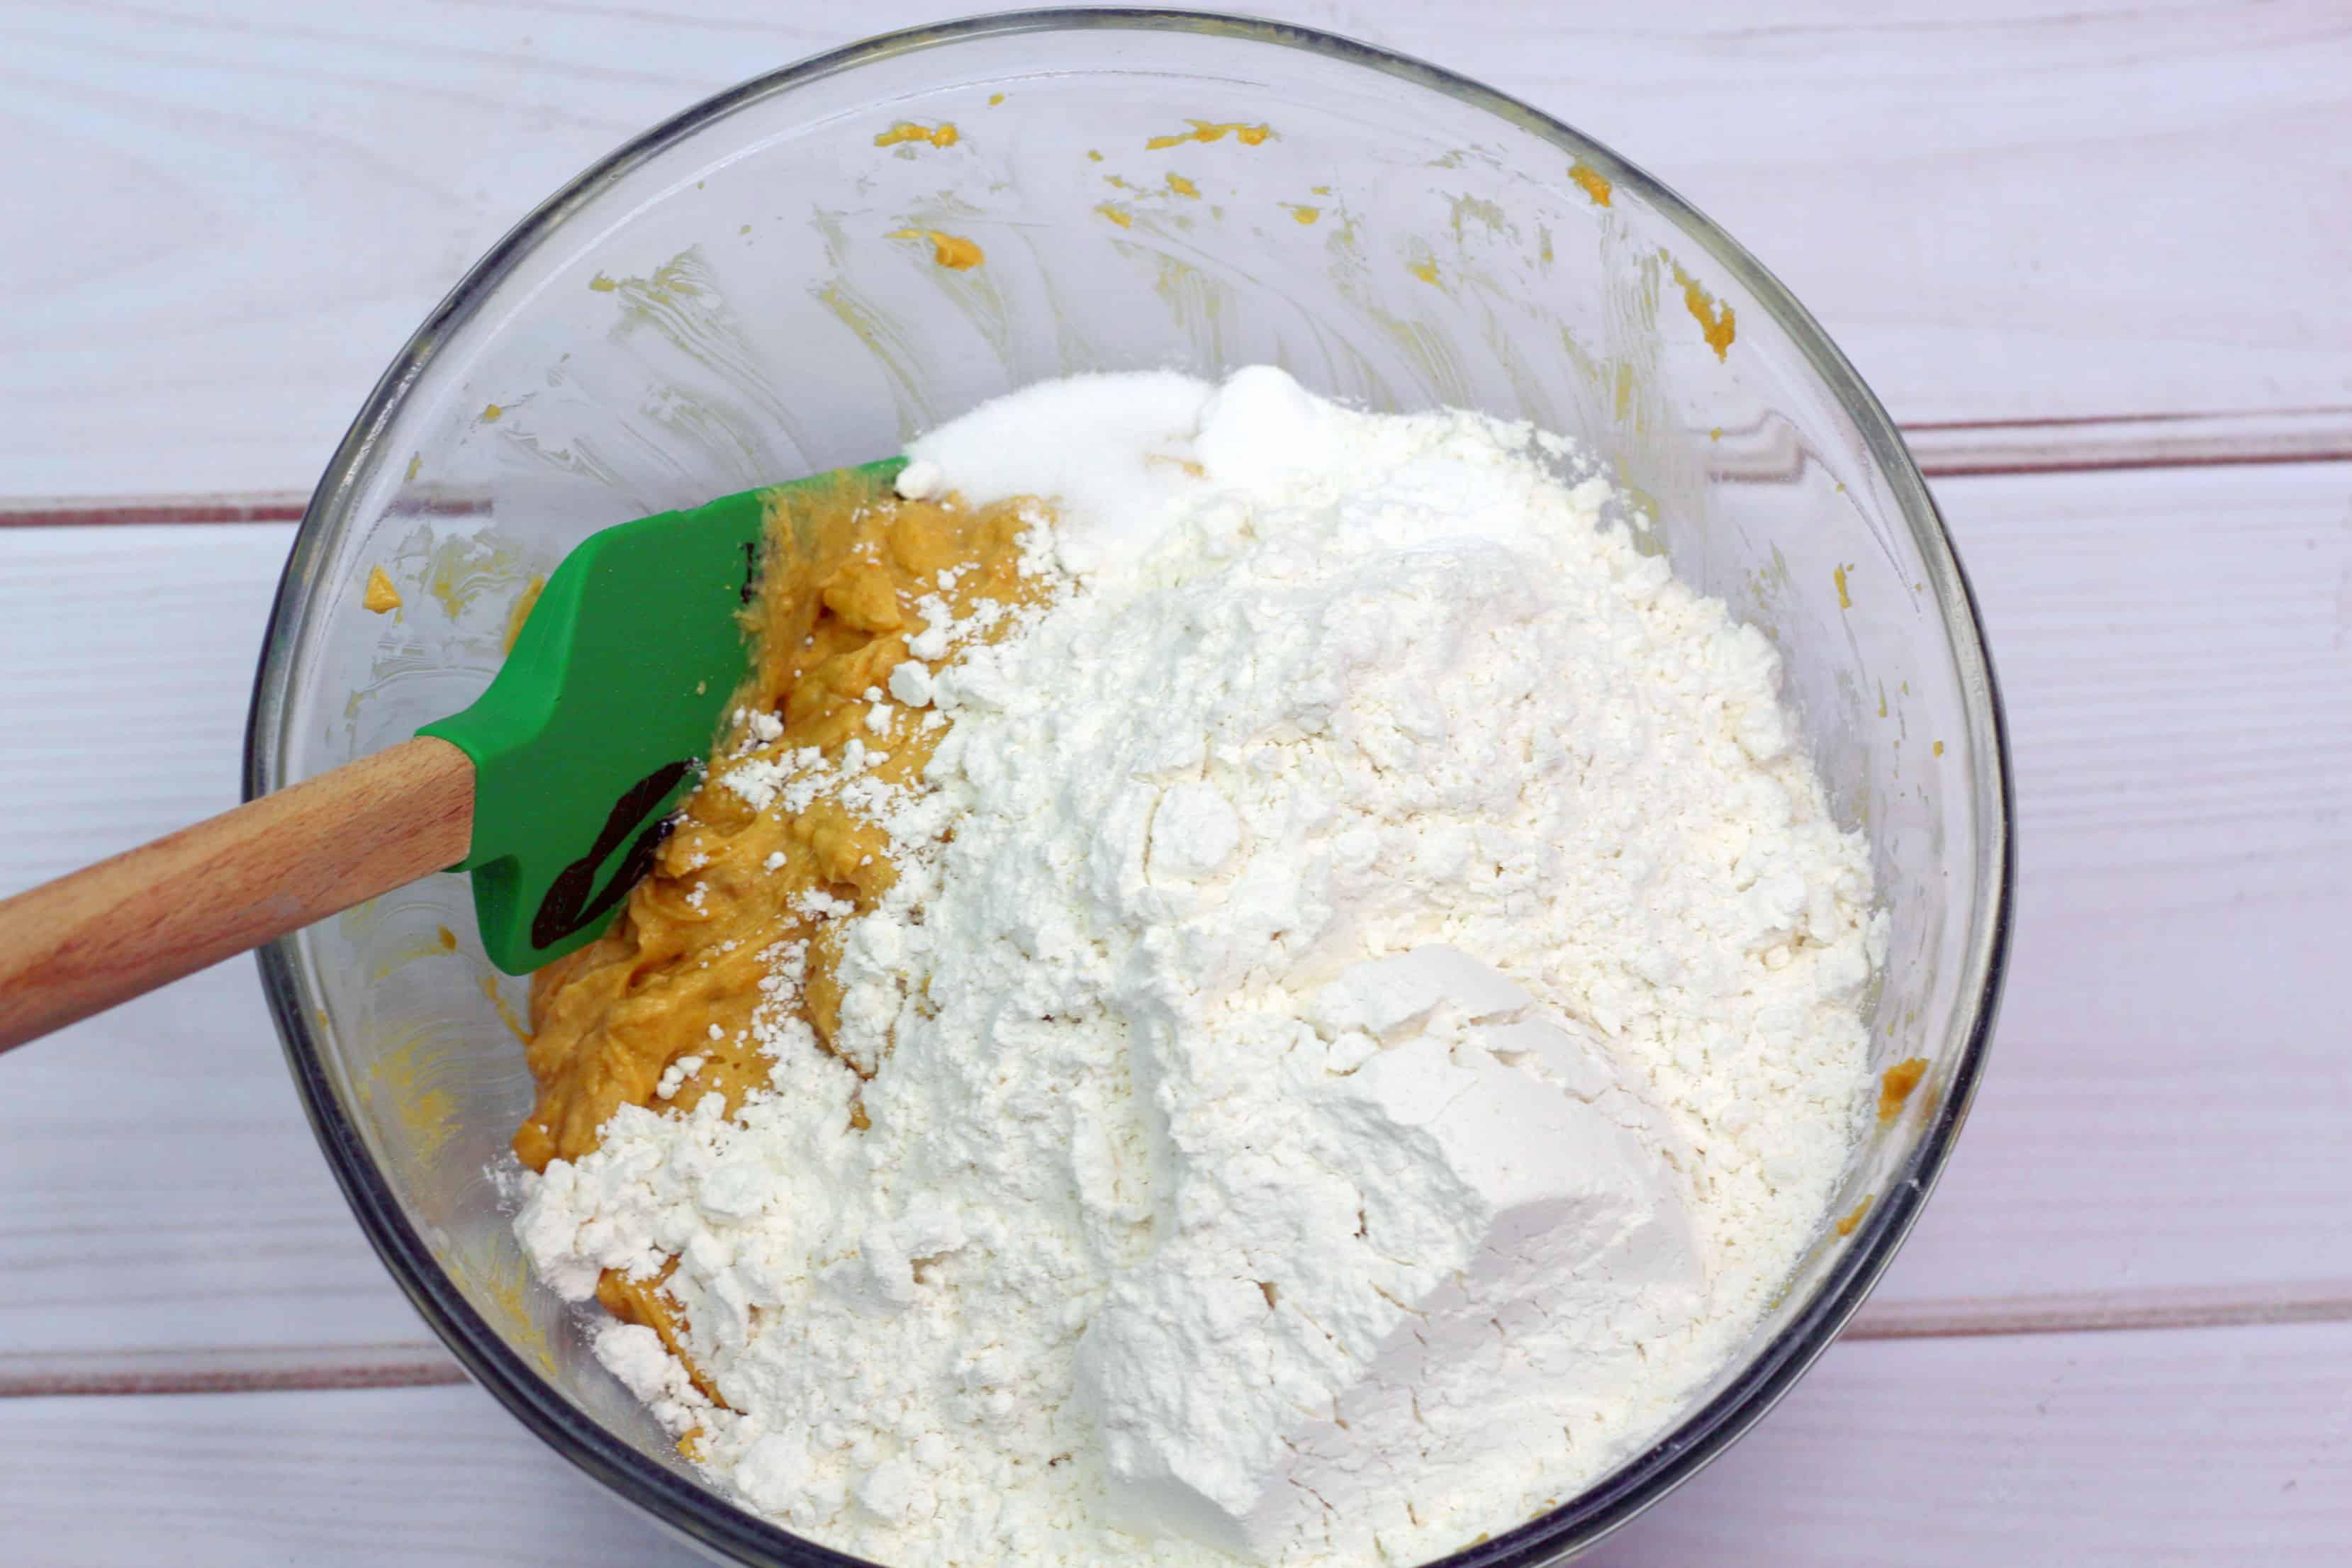 peanut butter and flour mixture